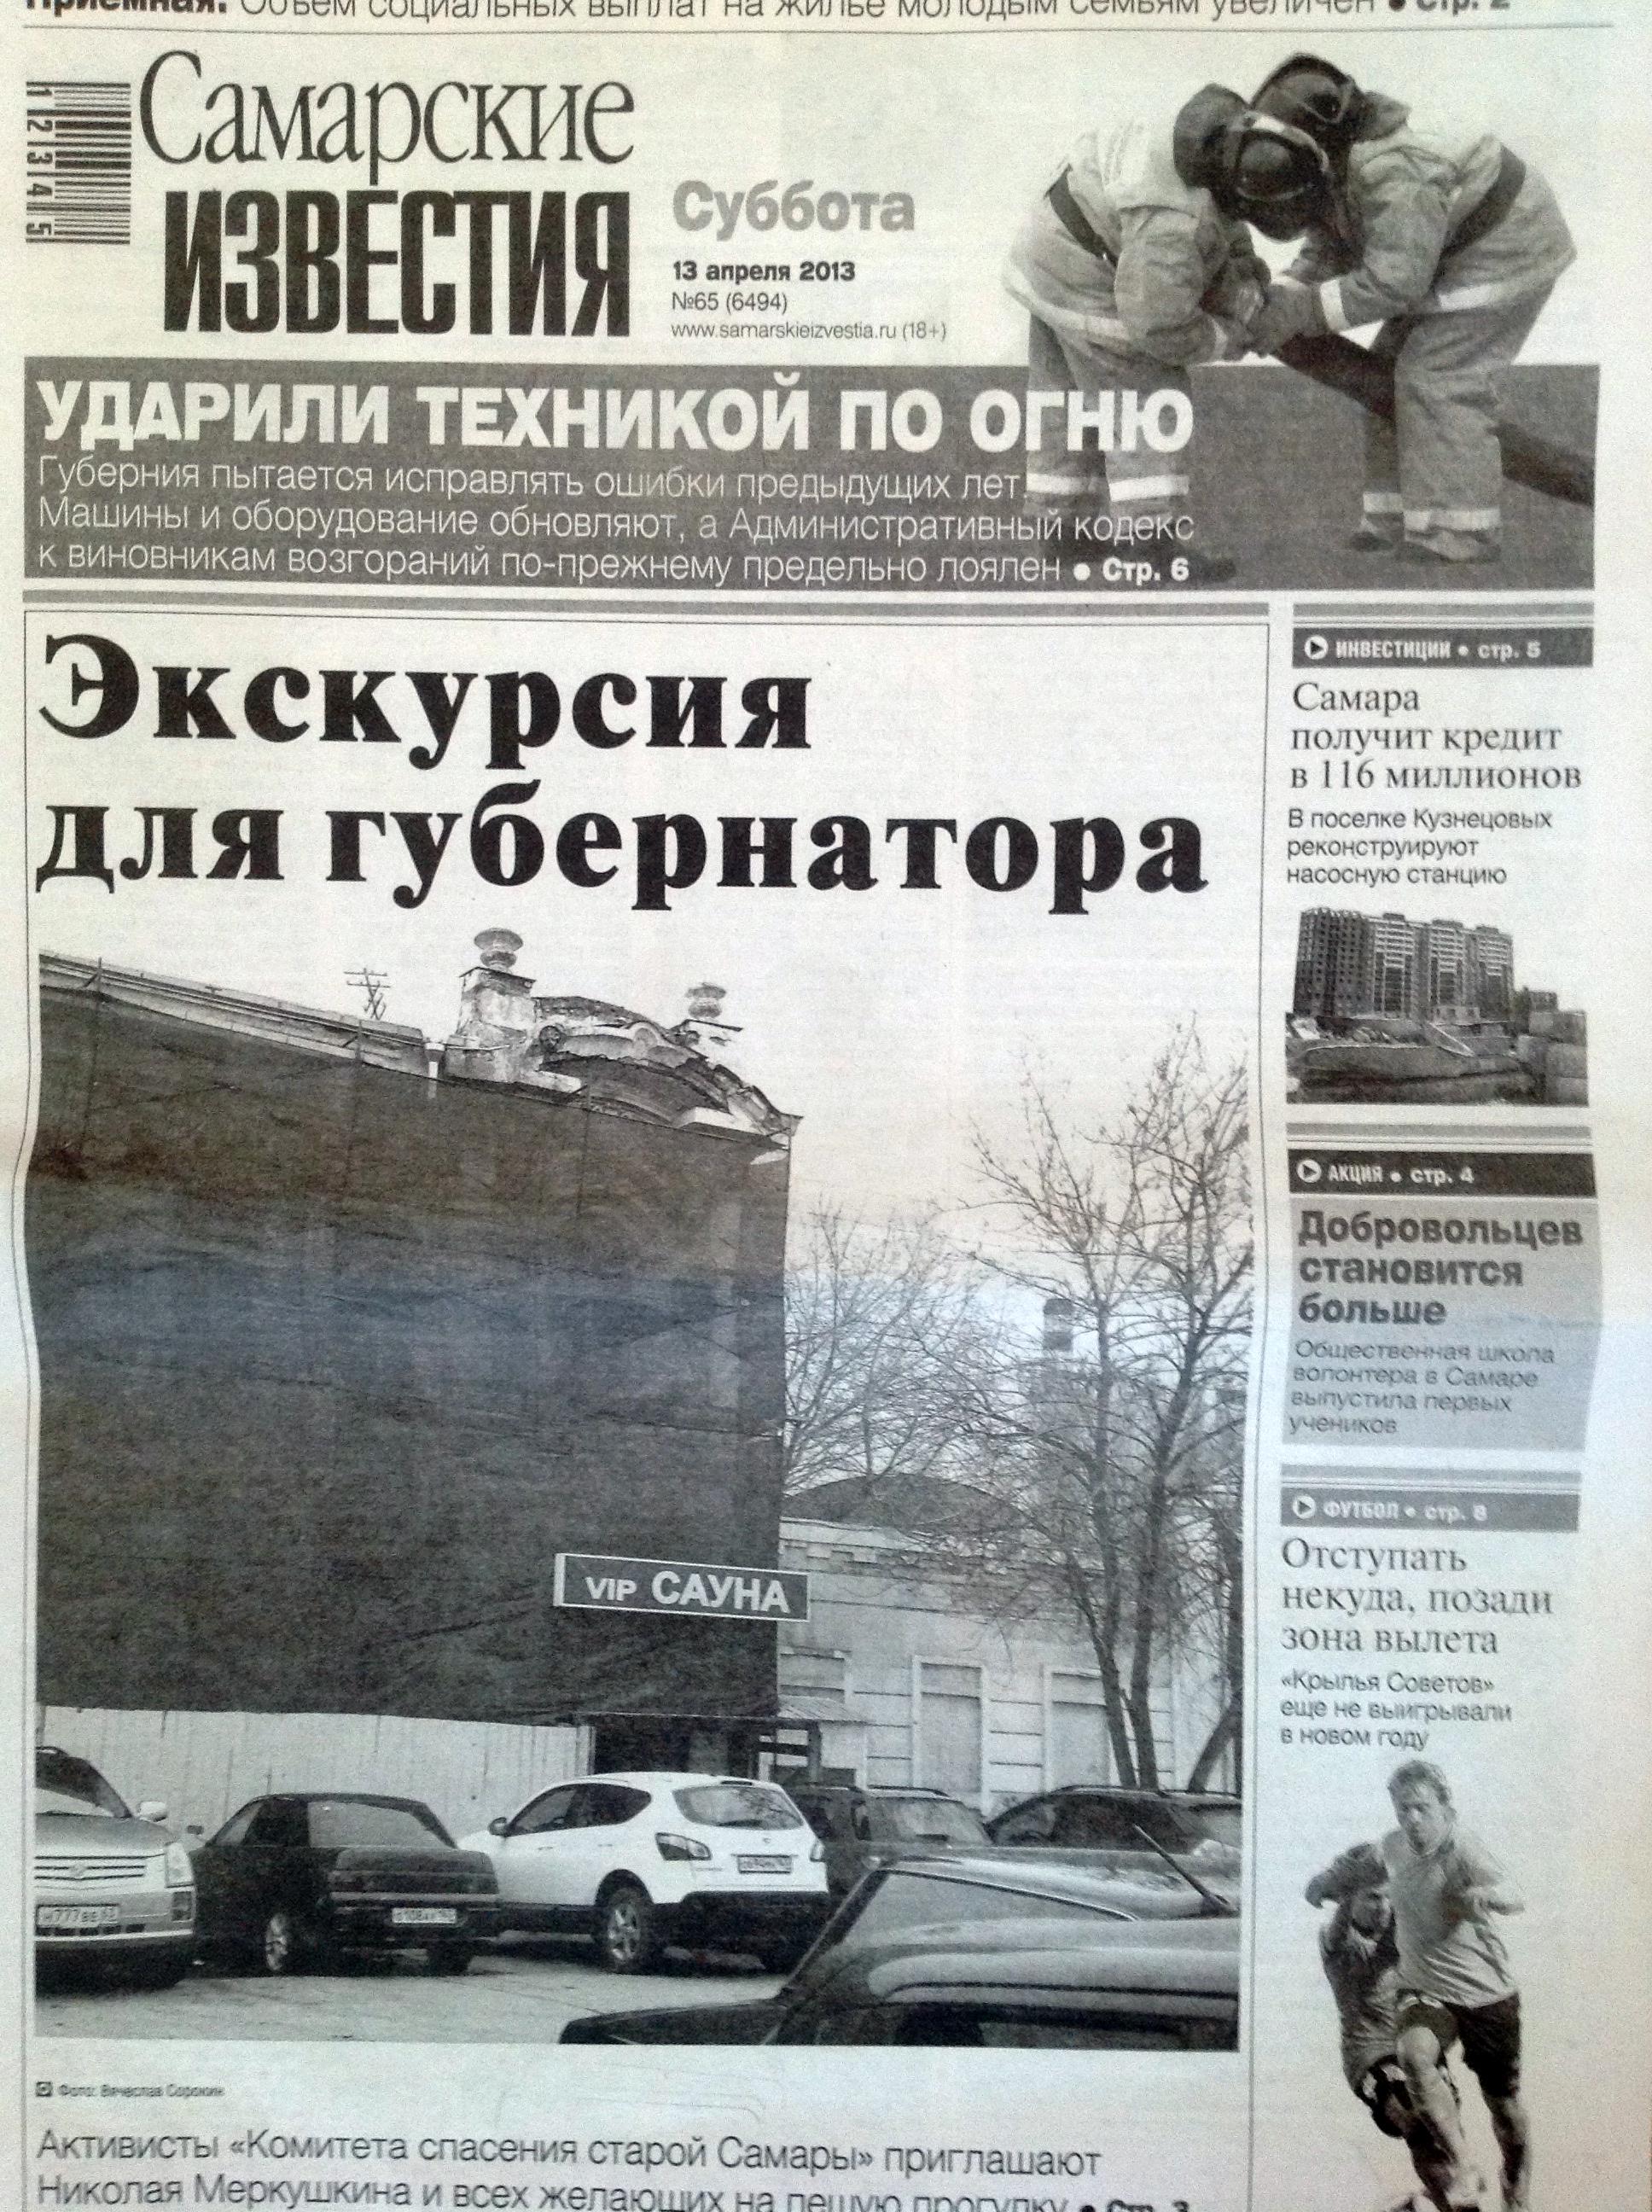 Провокация Самарских известий против Меркушкина